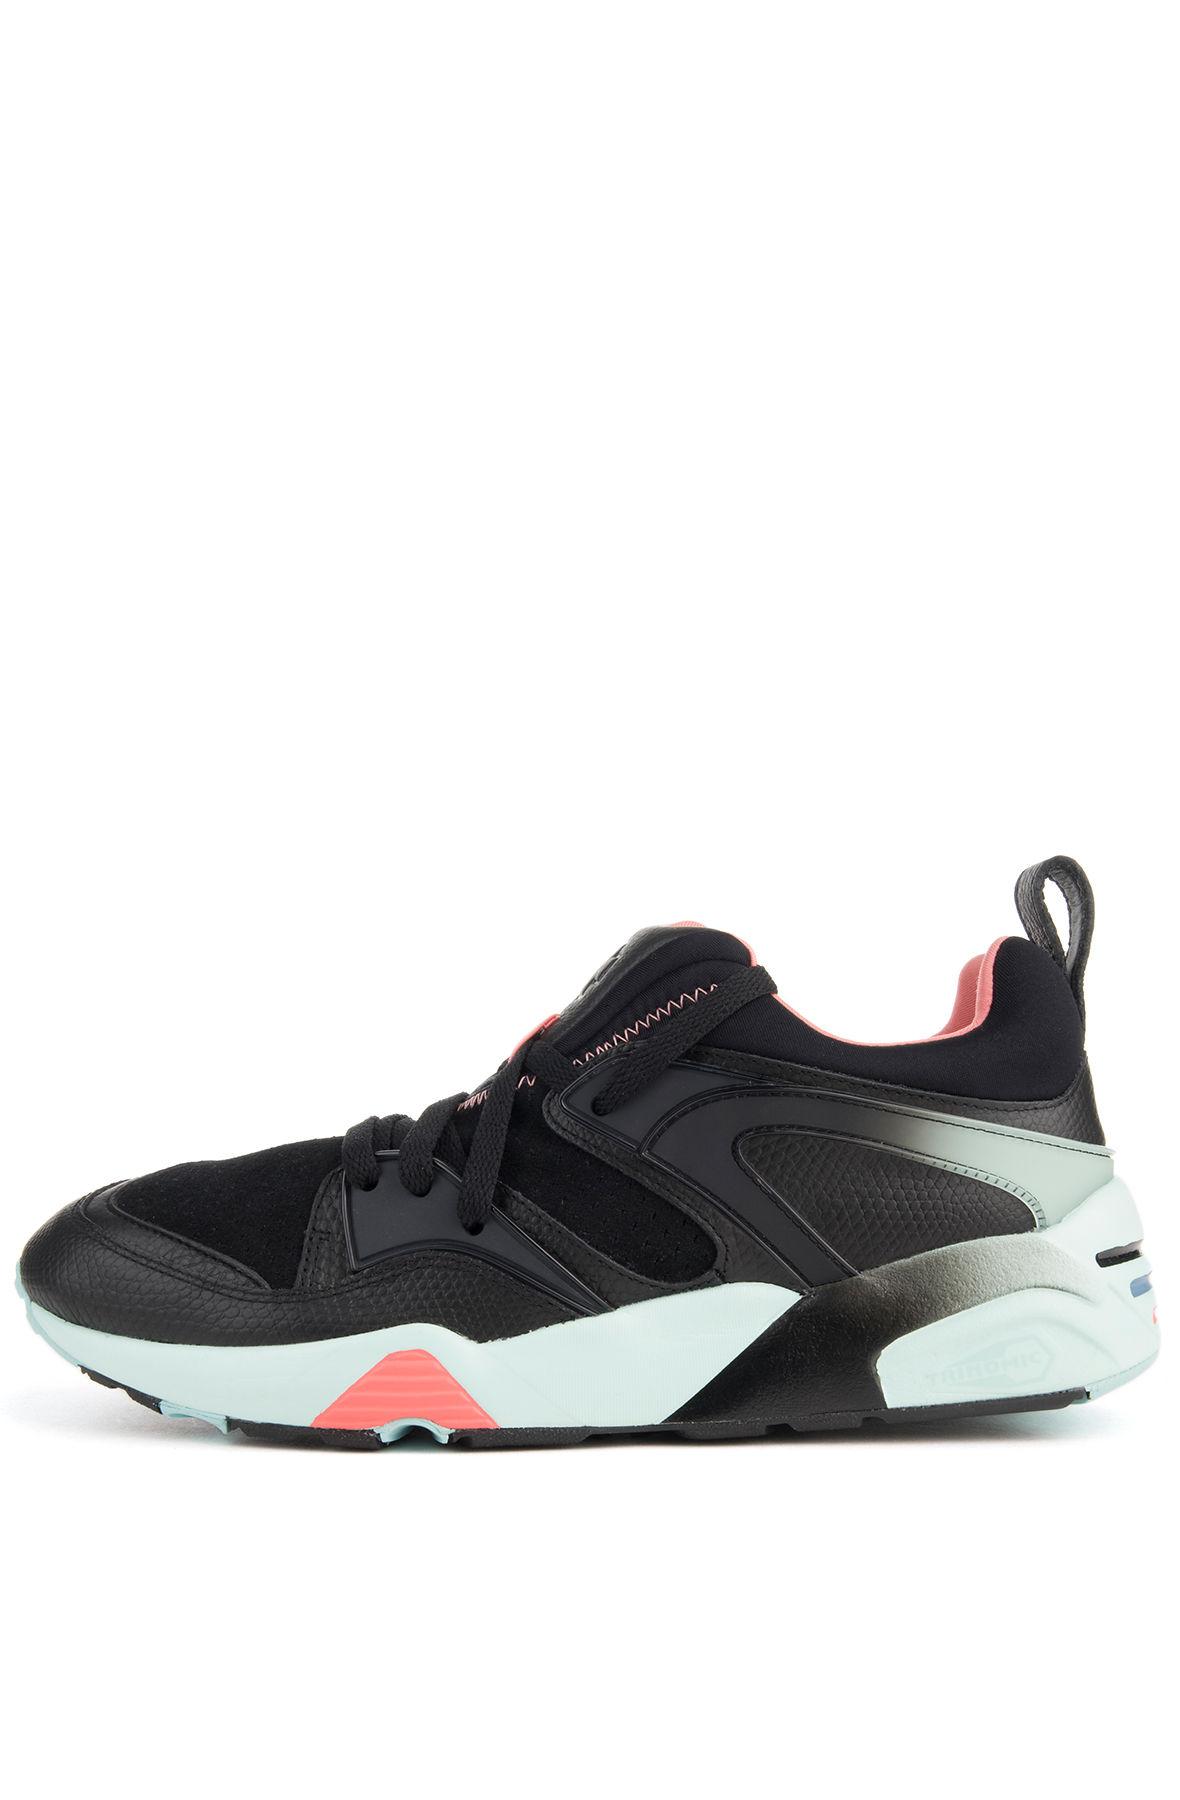 Sneaker Pink Dolphin x Puma Blaze of